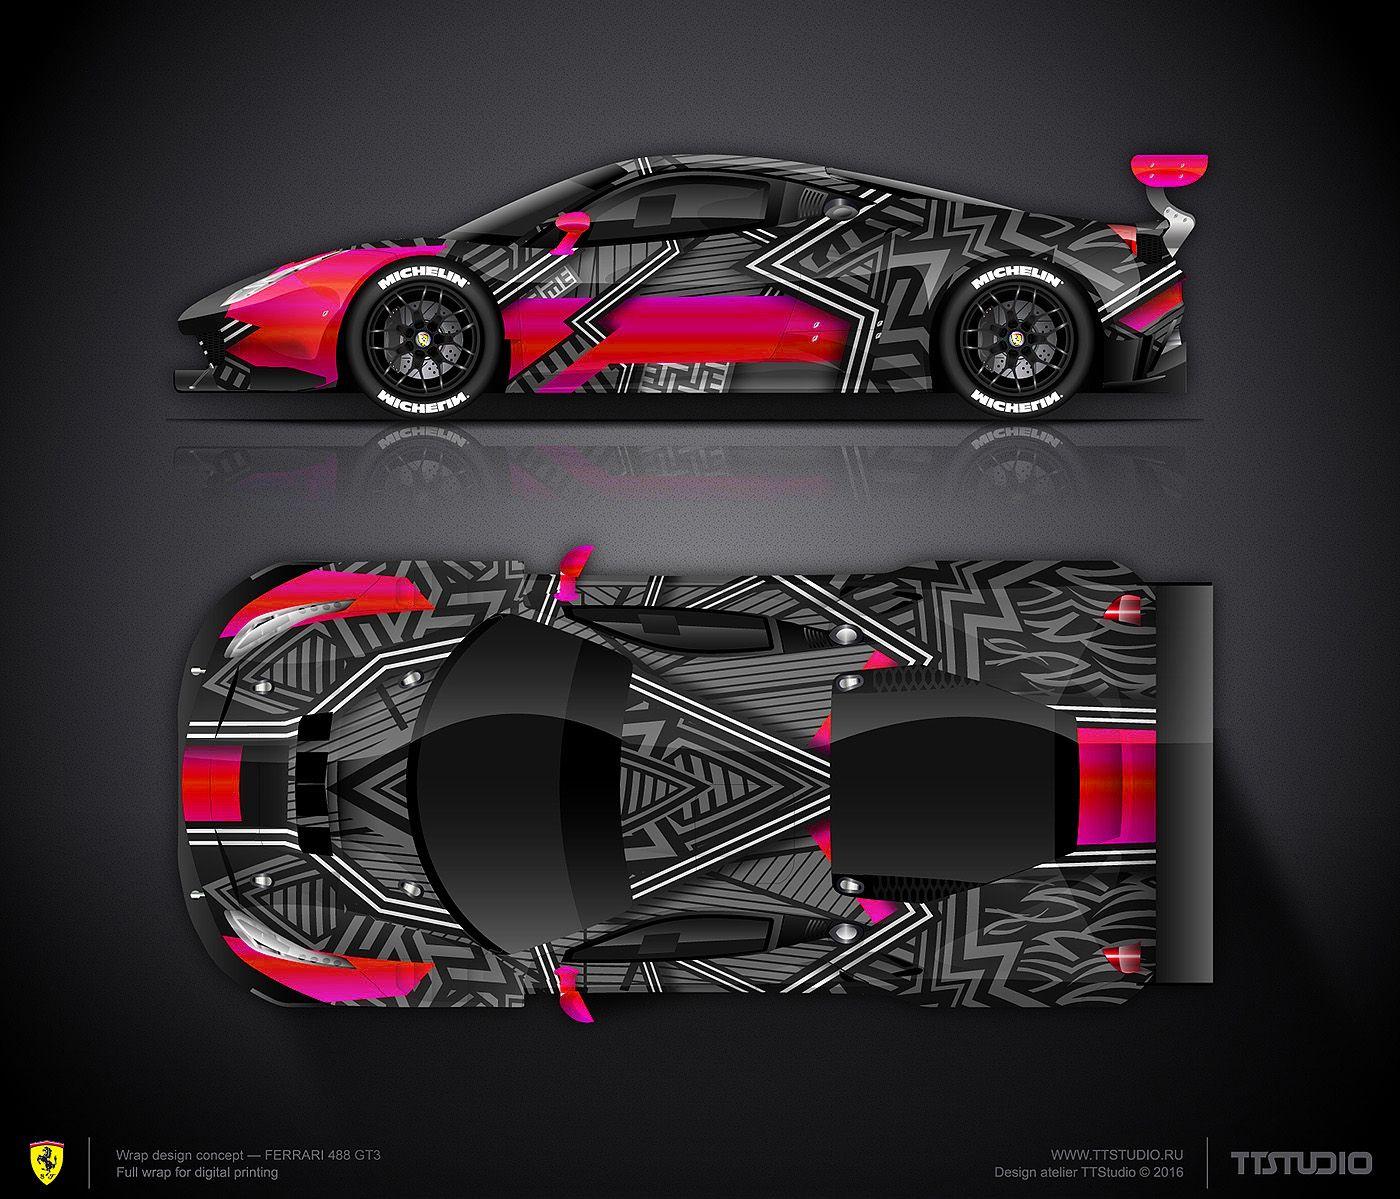 Wrap Design Concept Art Car For Ferrari F488 Gt3 For Sale Car Wrap